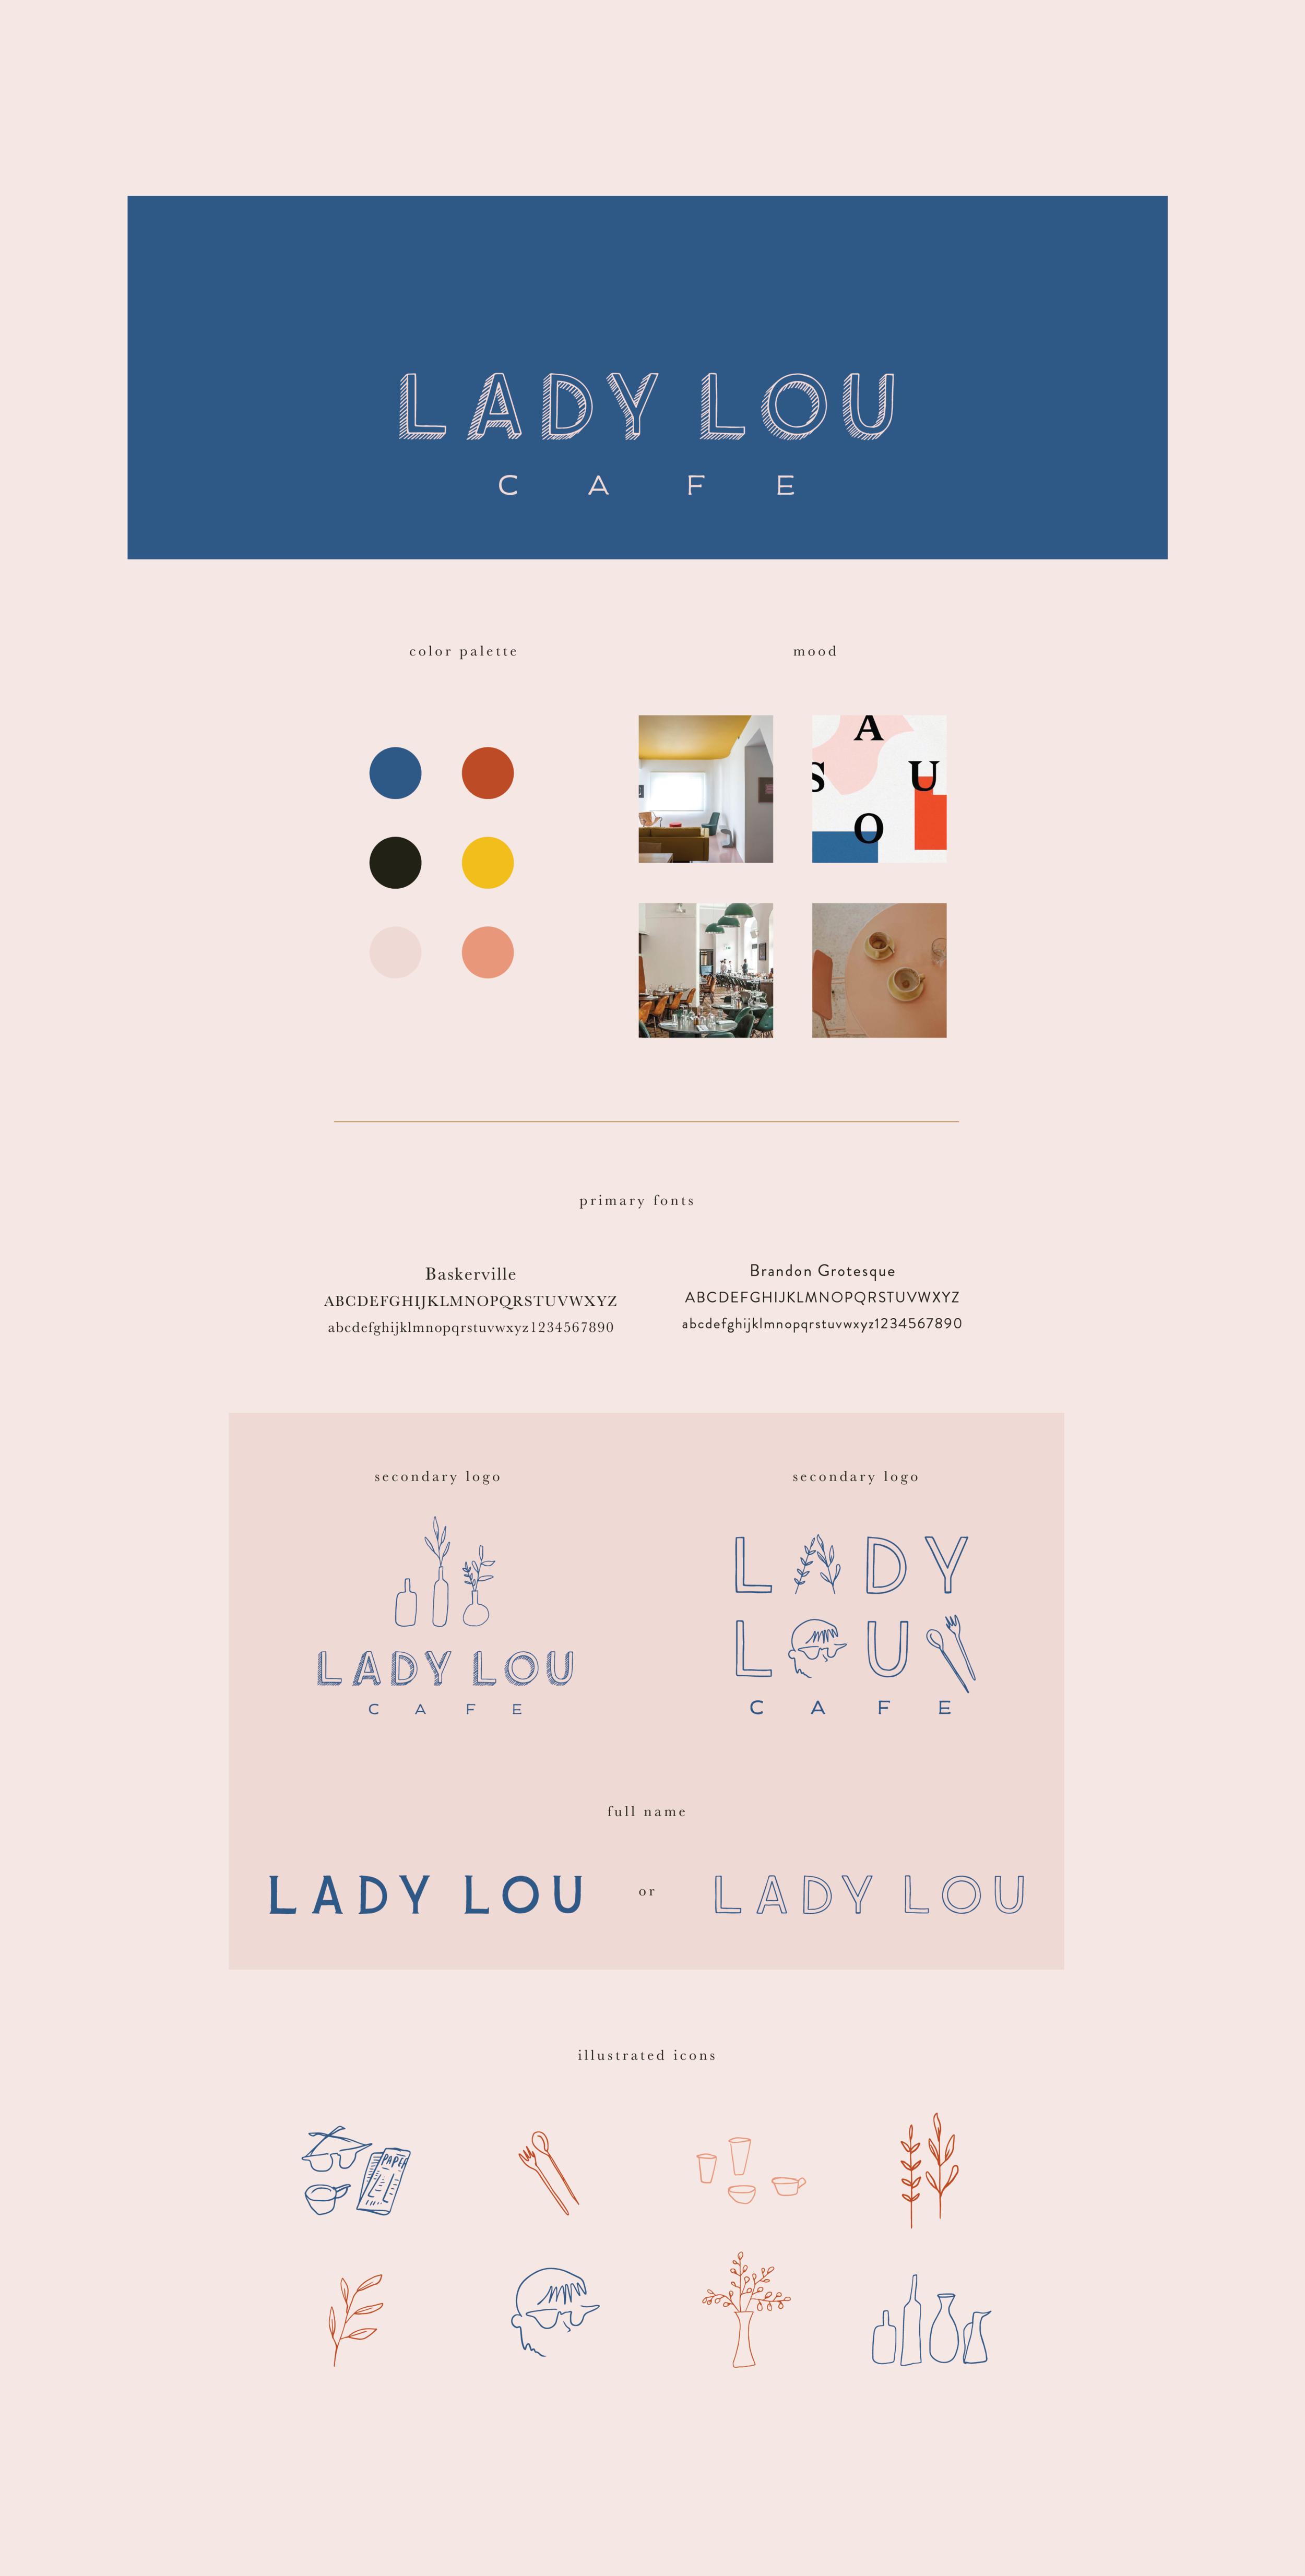 Lady Lou Brand Identity Guide